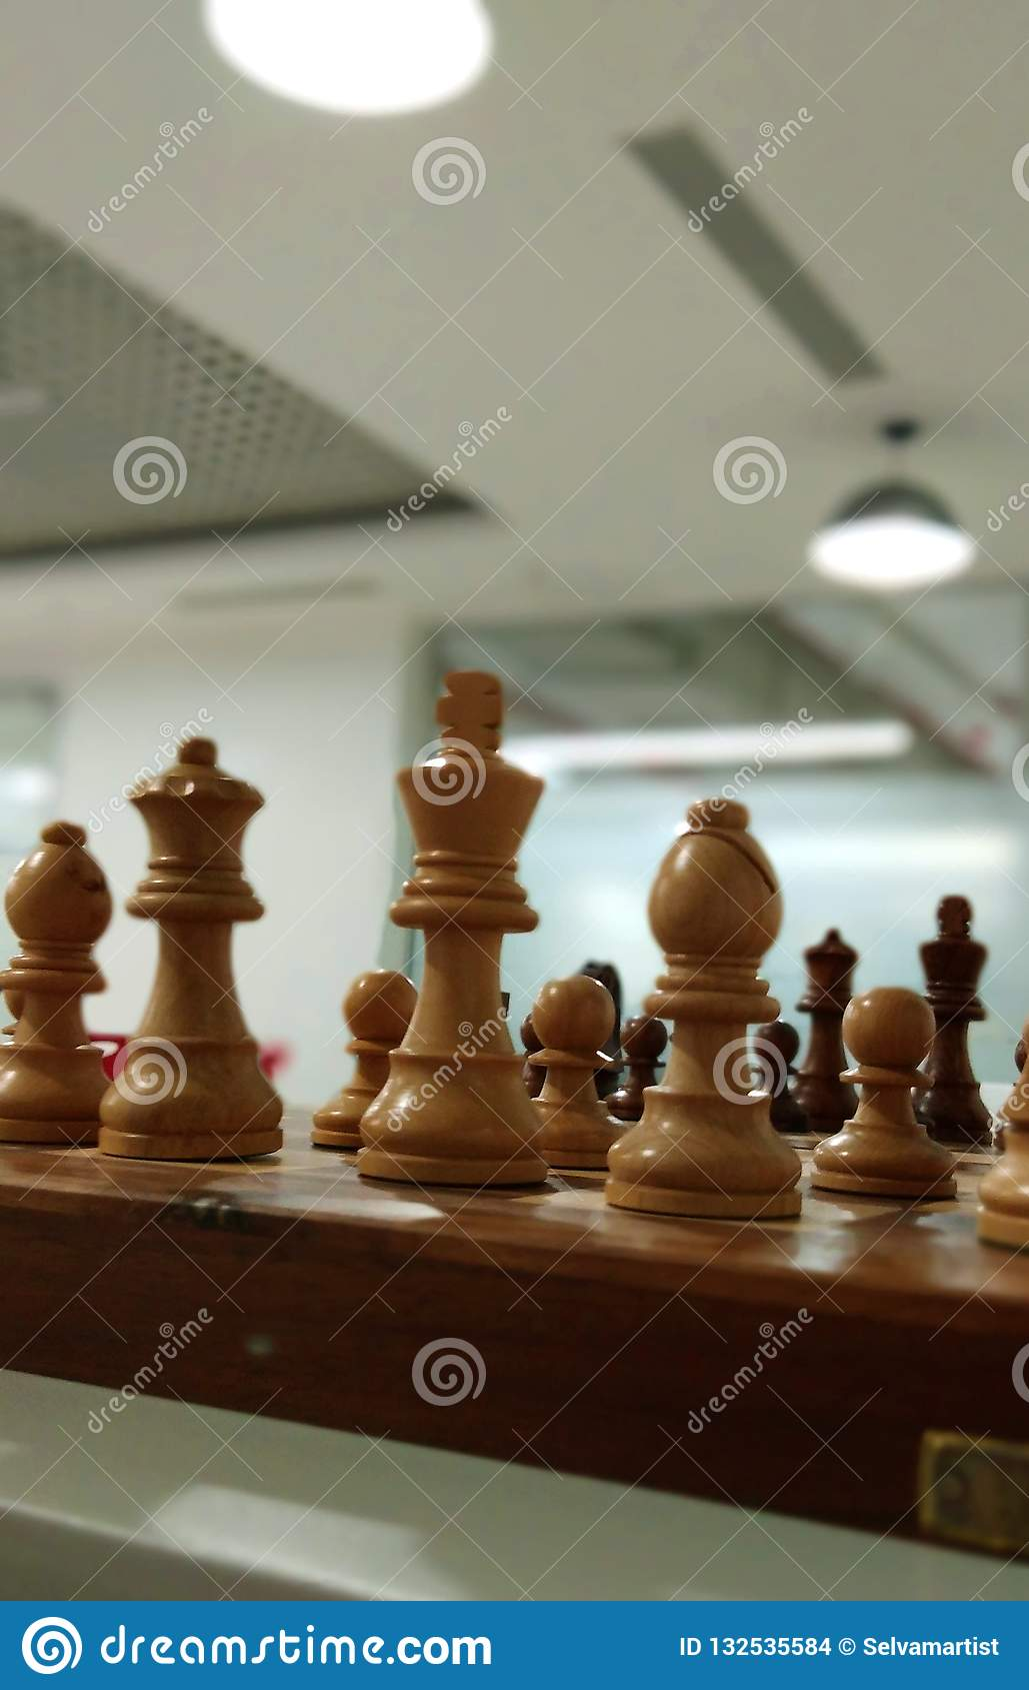 Uma ideia da parte de xadrez na placa de xadrez